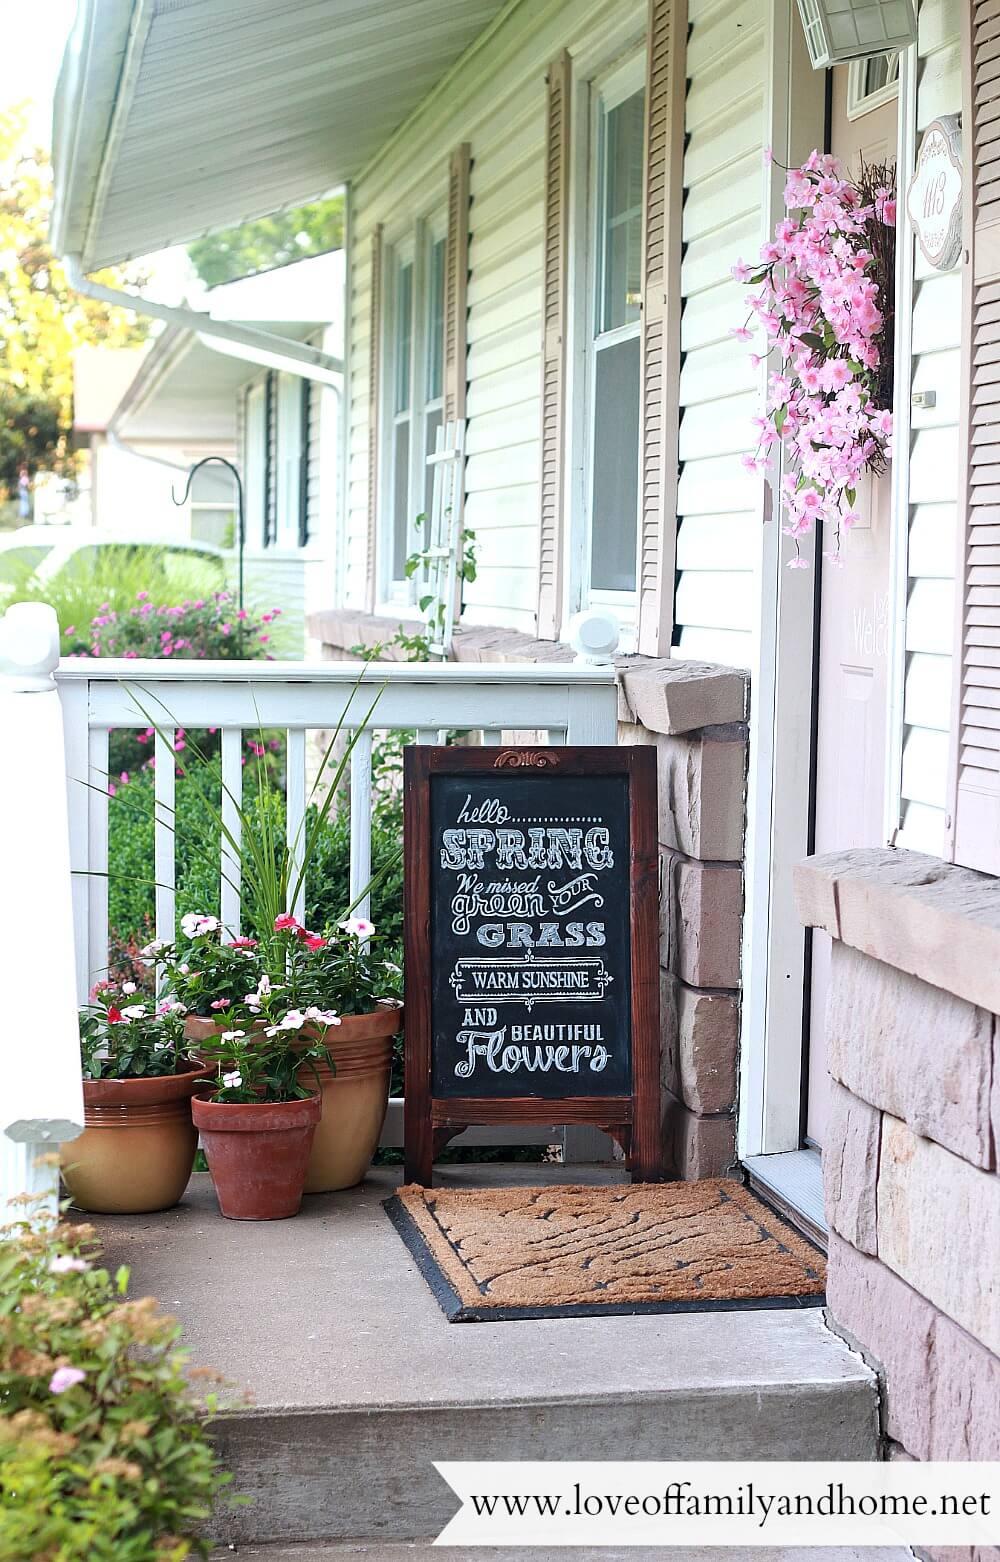 Chalkboard Sandwich Sign and Oversized Flower Pots